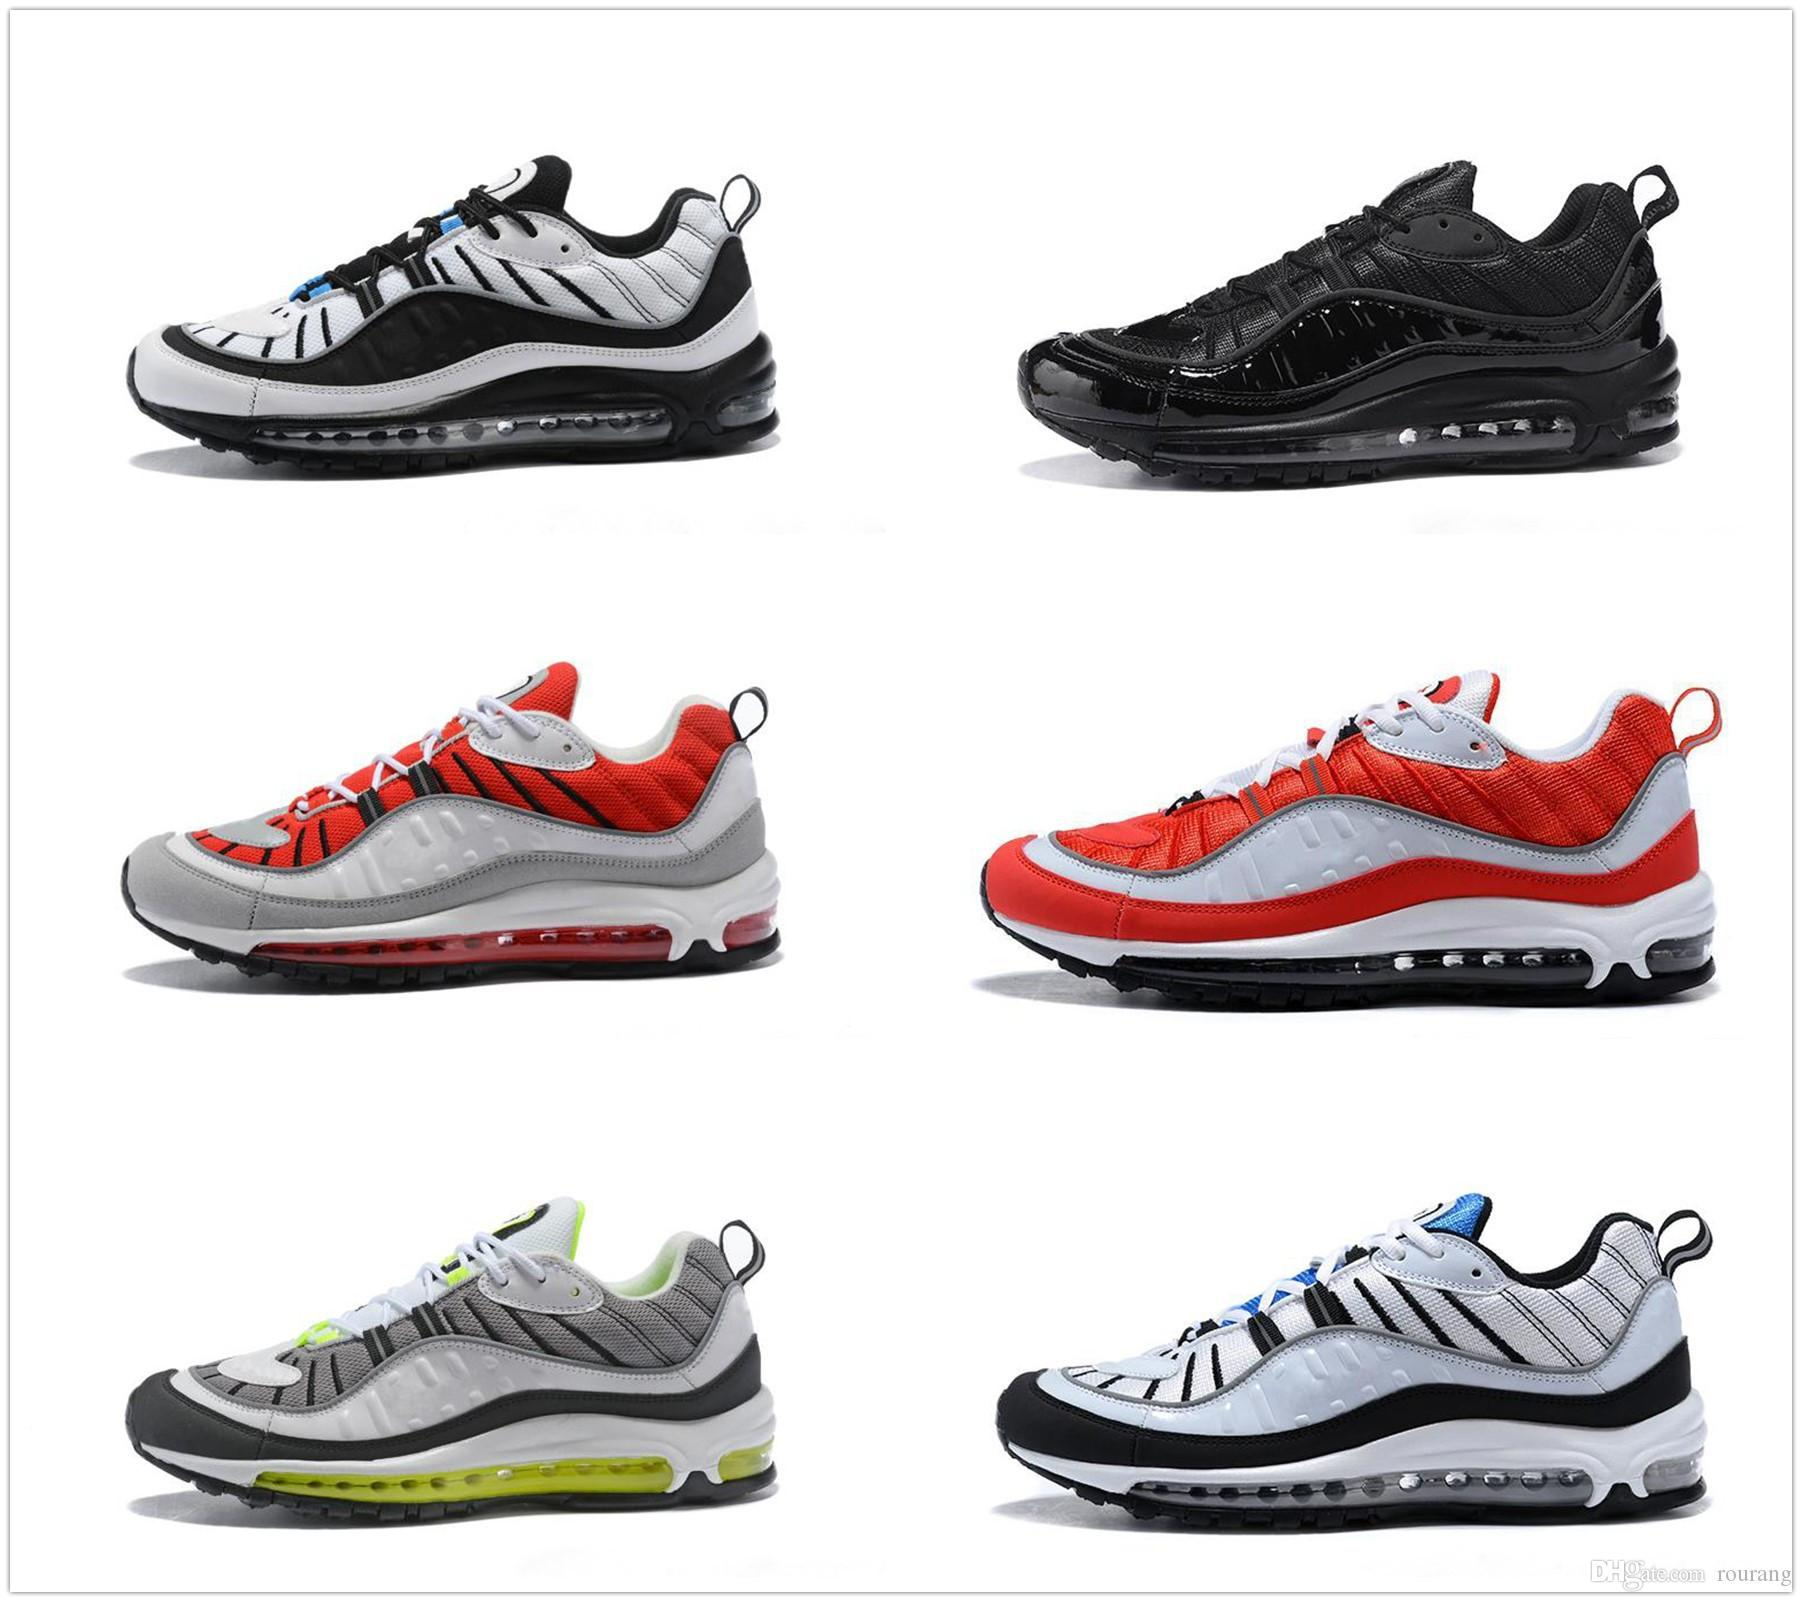 Nike Air Max airmax 98 98 New Cushion Gundam Tour Blanco Hombres Mujeres 98s Zapatillas de running Zapatillas de deporte Atlético Deporte al aire